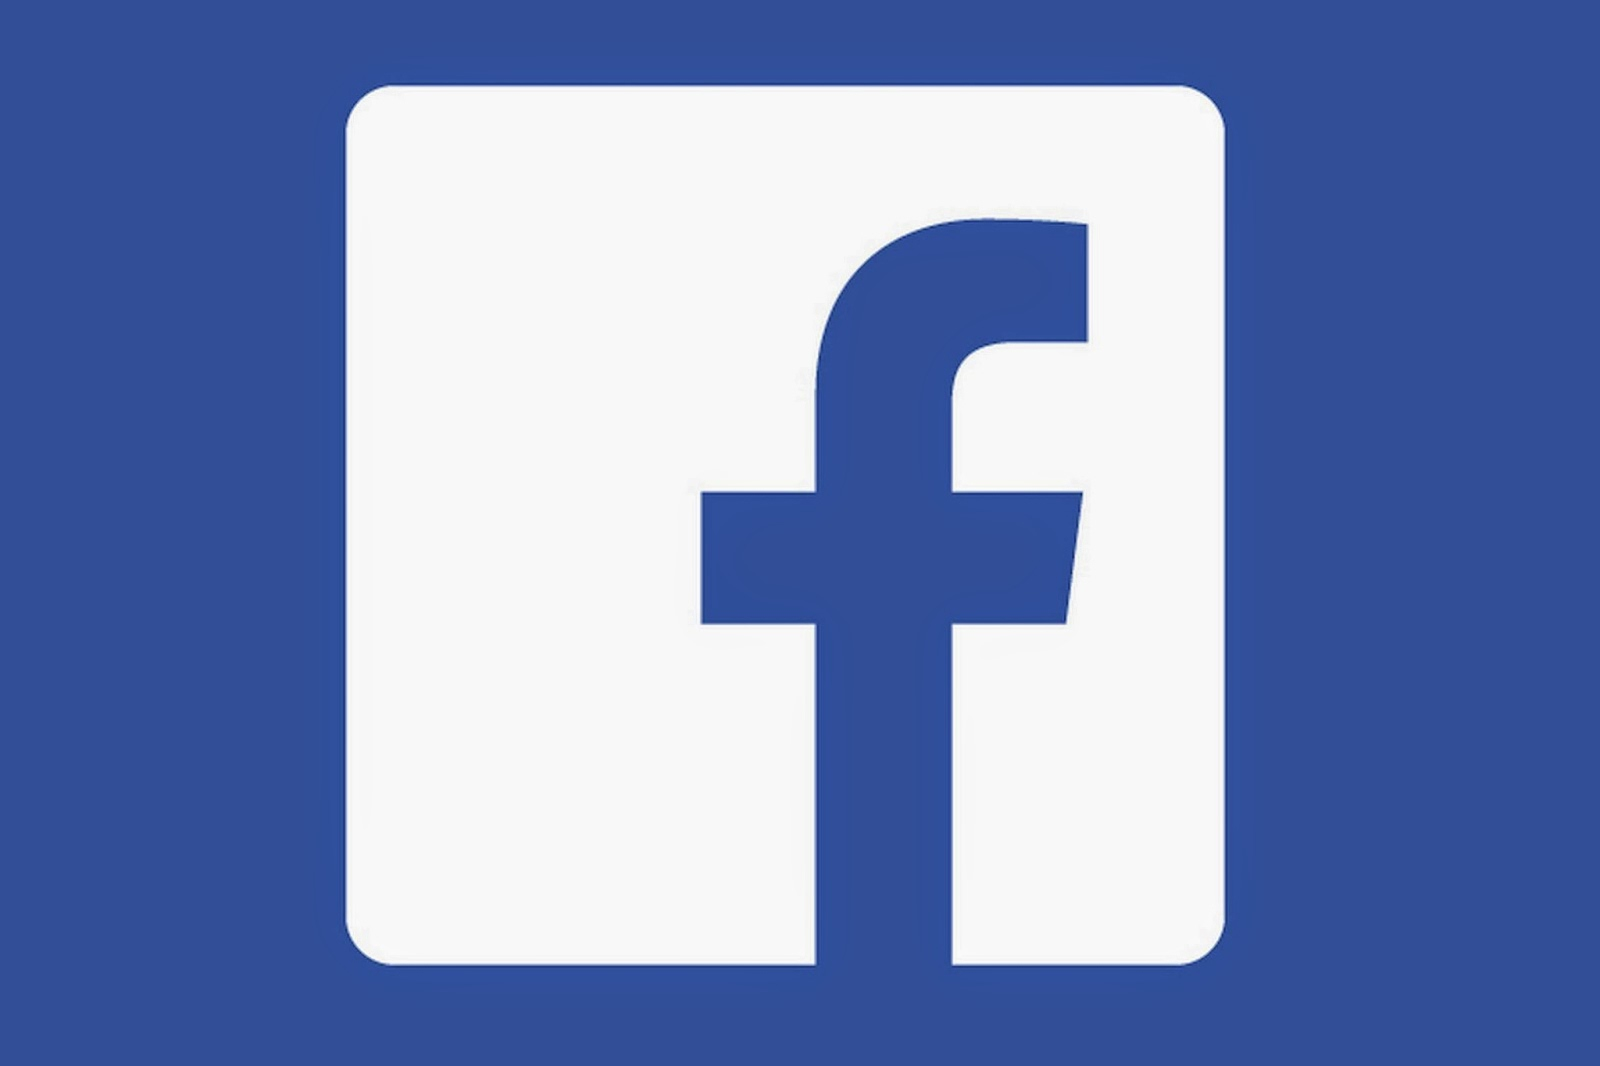 Facebook_Vector_Logo_Hd_06.jpg